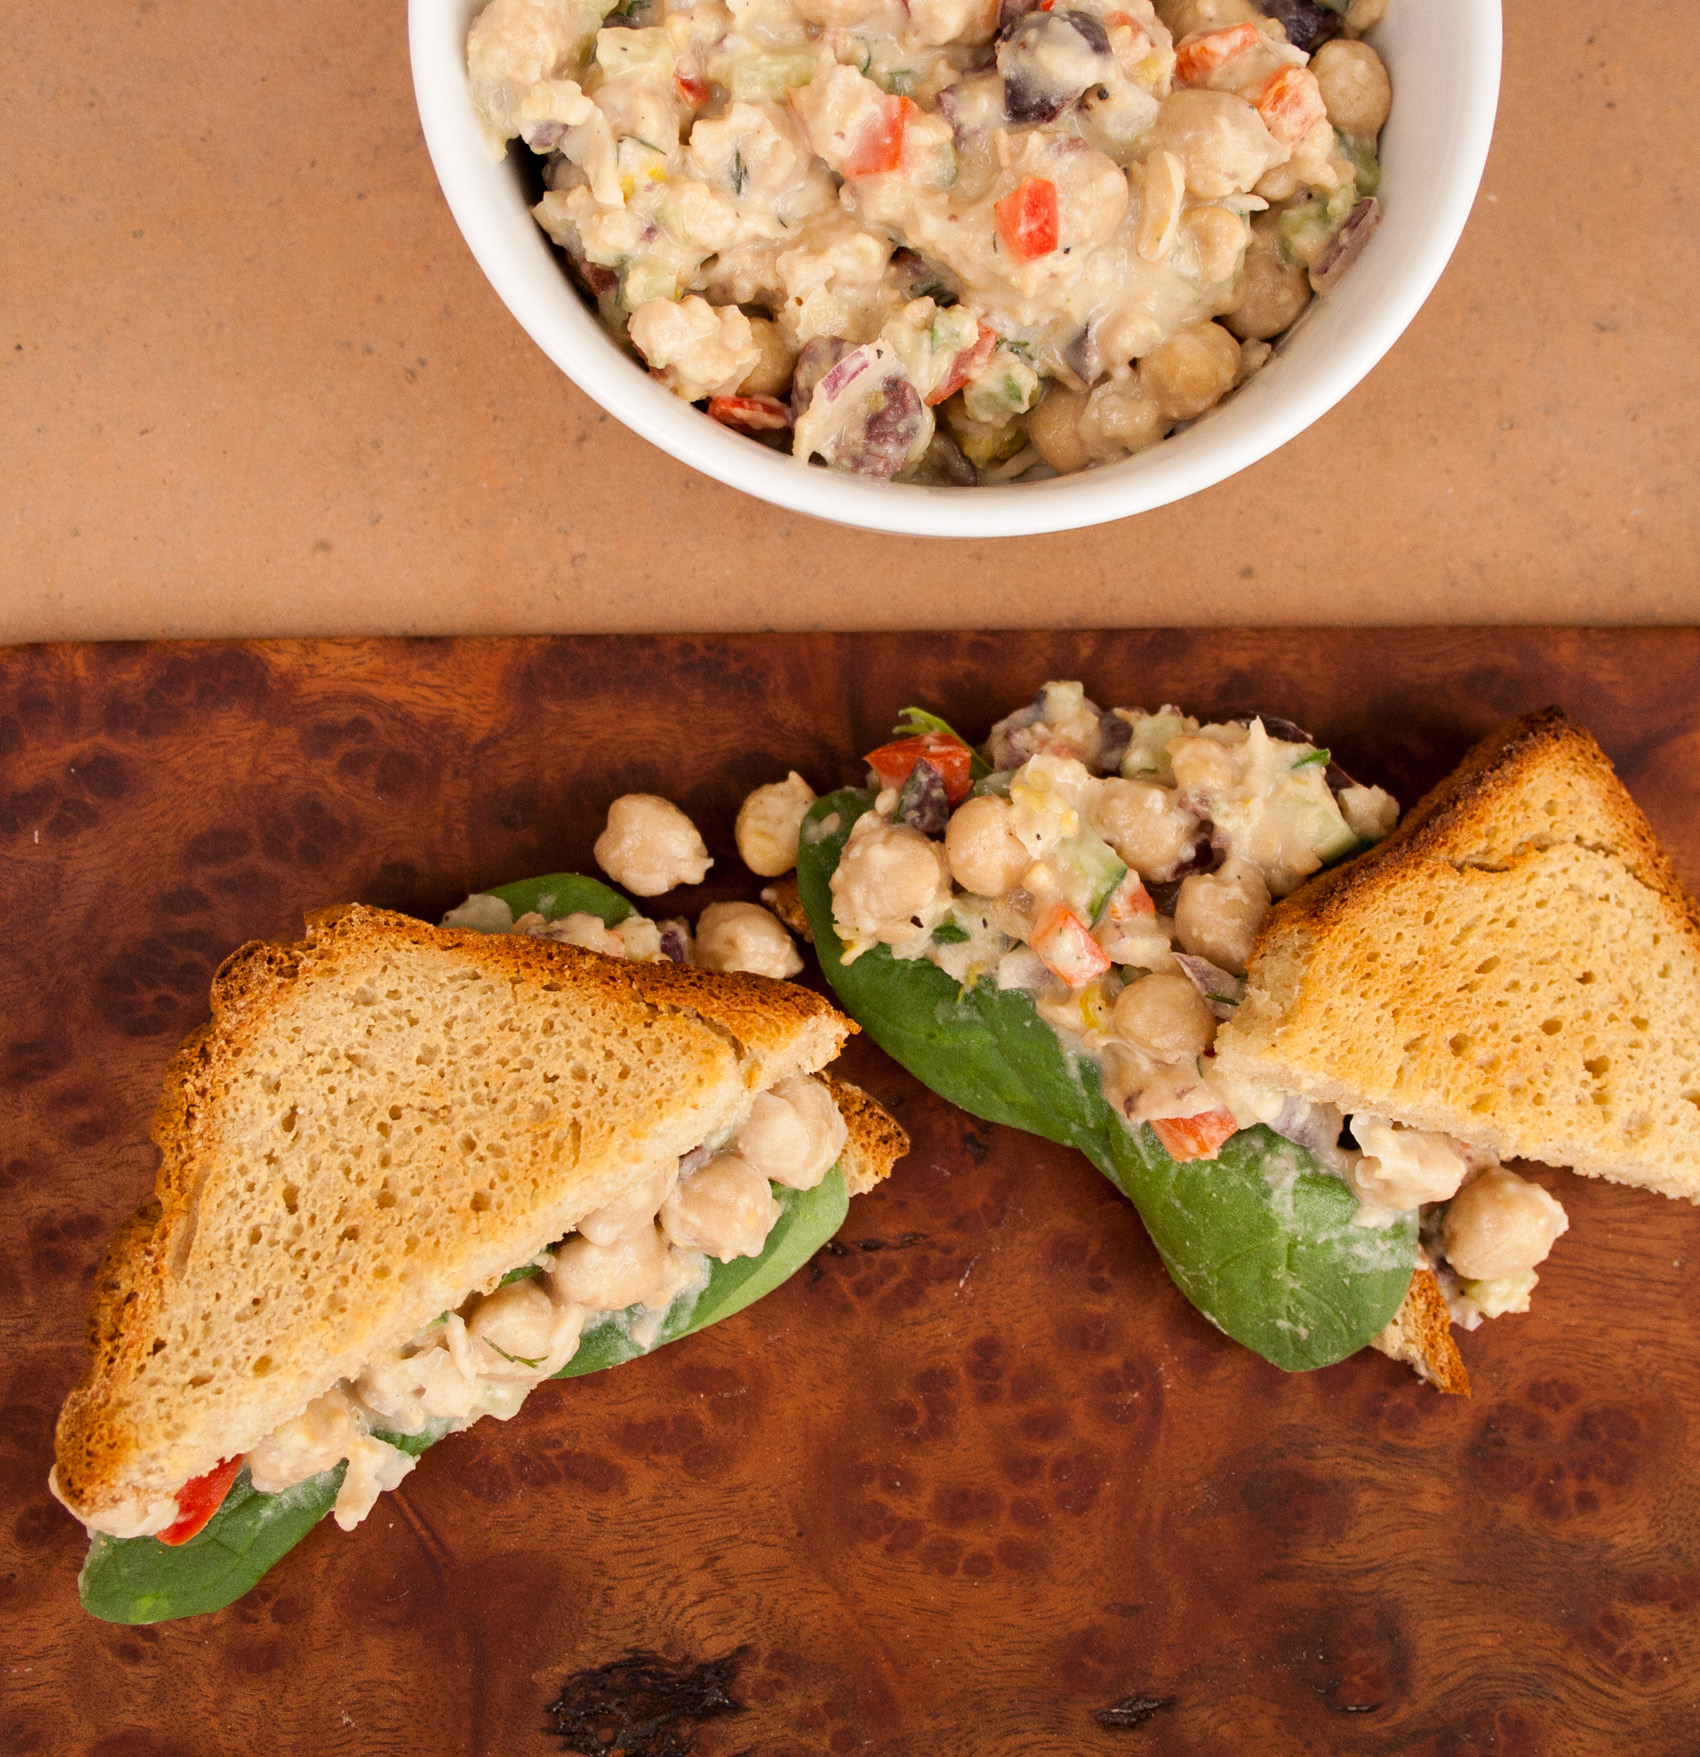 Chickpea Salad Sandwich with Vegan Tzatziki birds eye view.